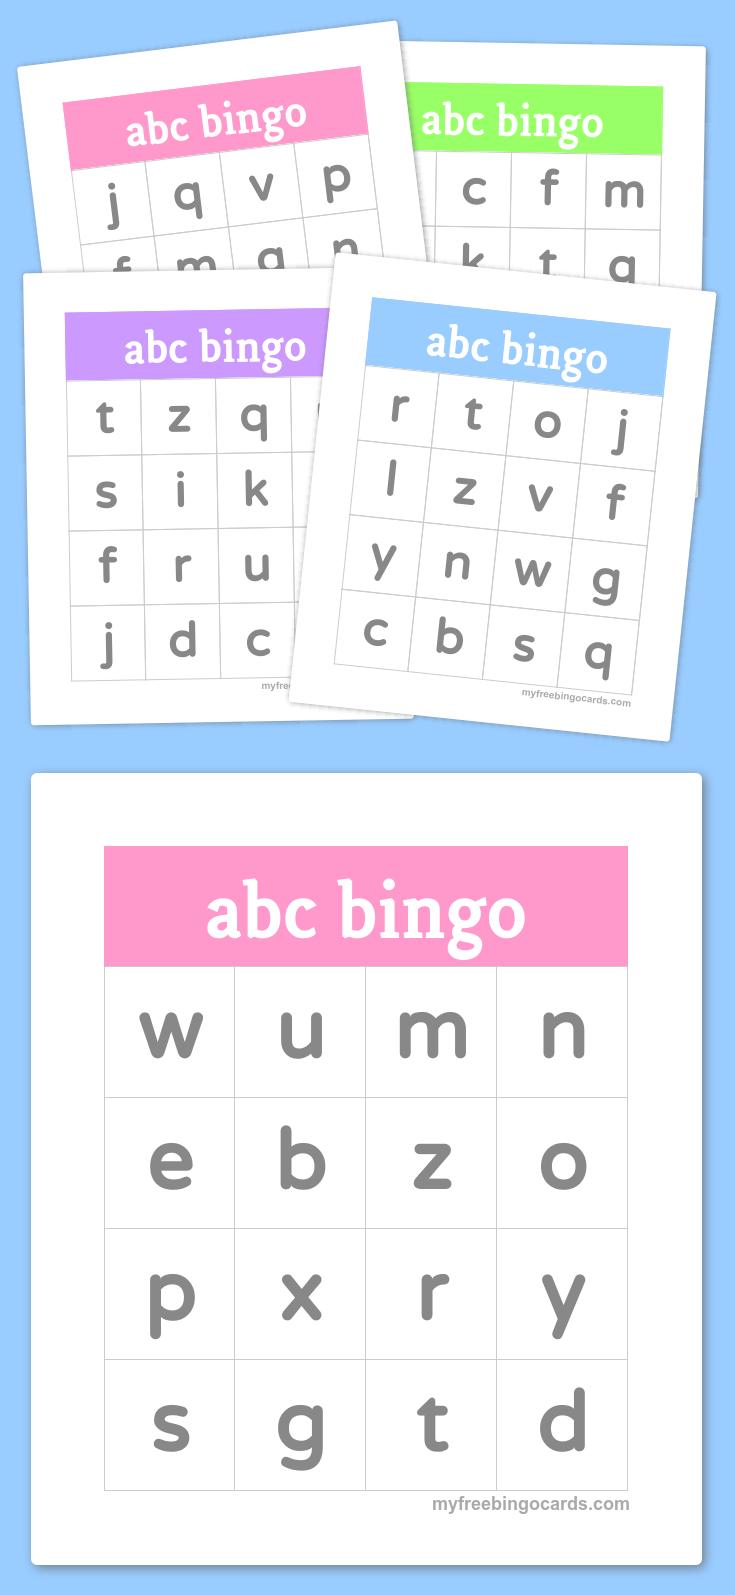 aa63343f3cd10018b540f08fc26c98c2 Lower Case Letter A Template on free printable, printable alphabet, alphabet craft,